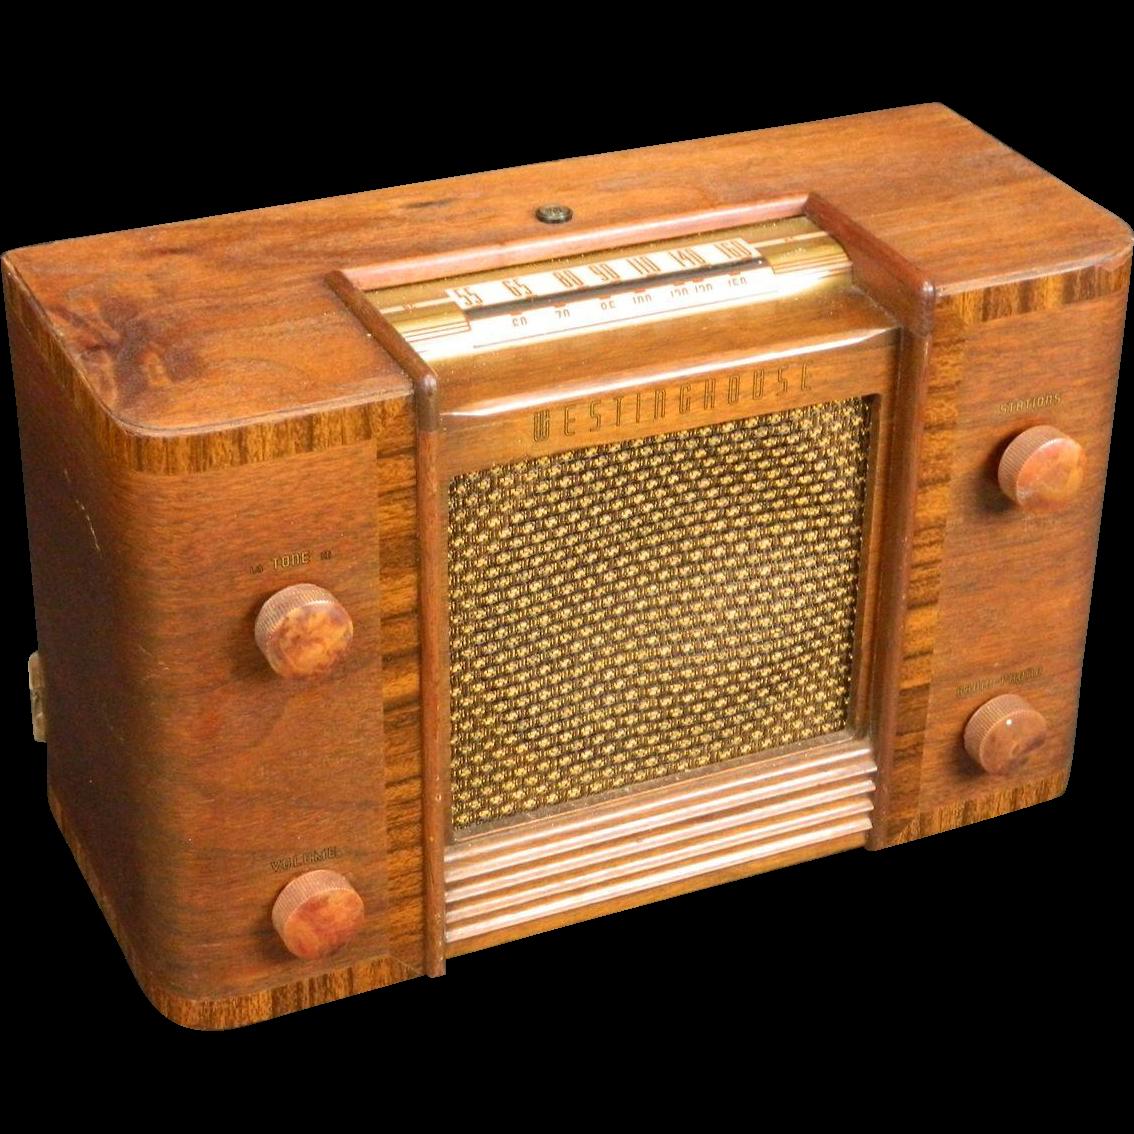 1946 Westinghouse Am Radio Model H130